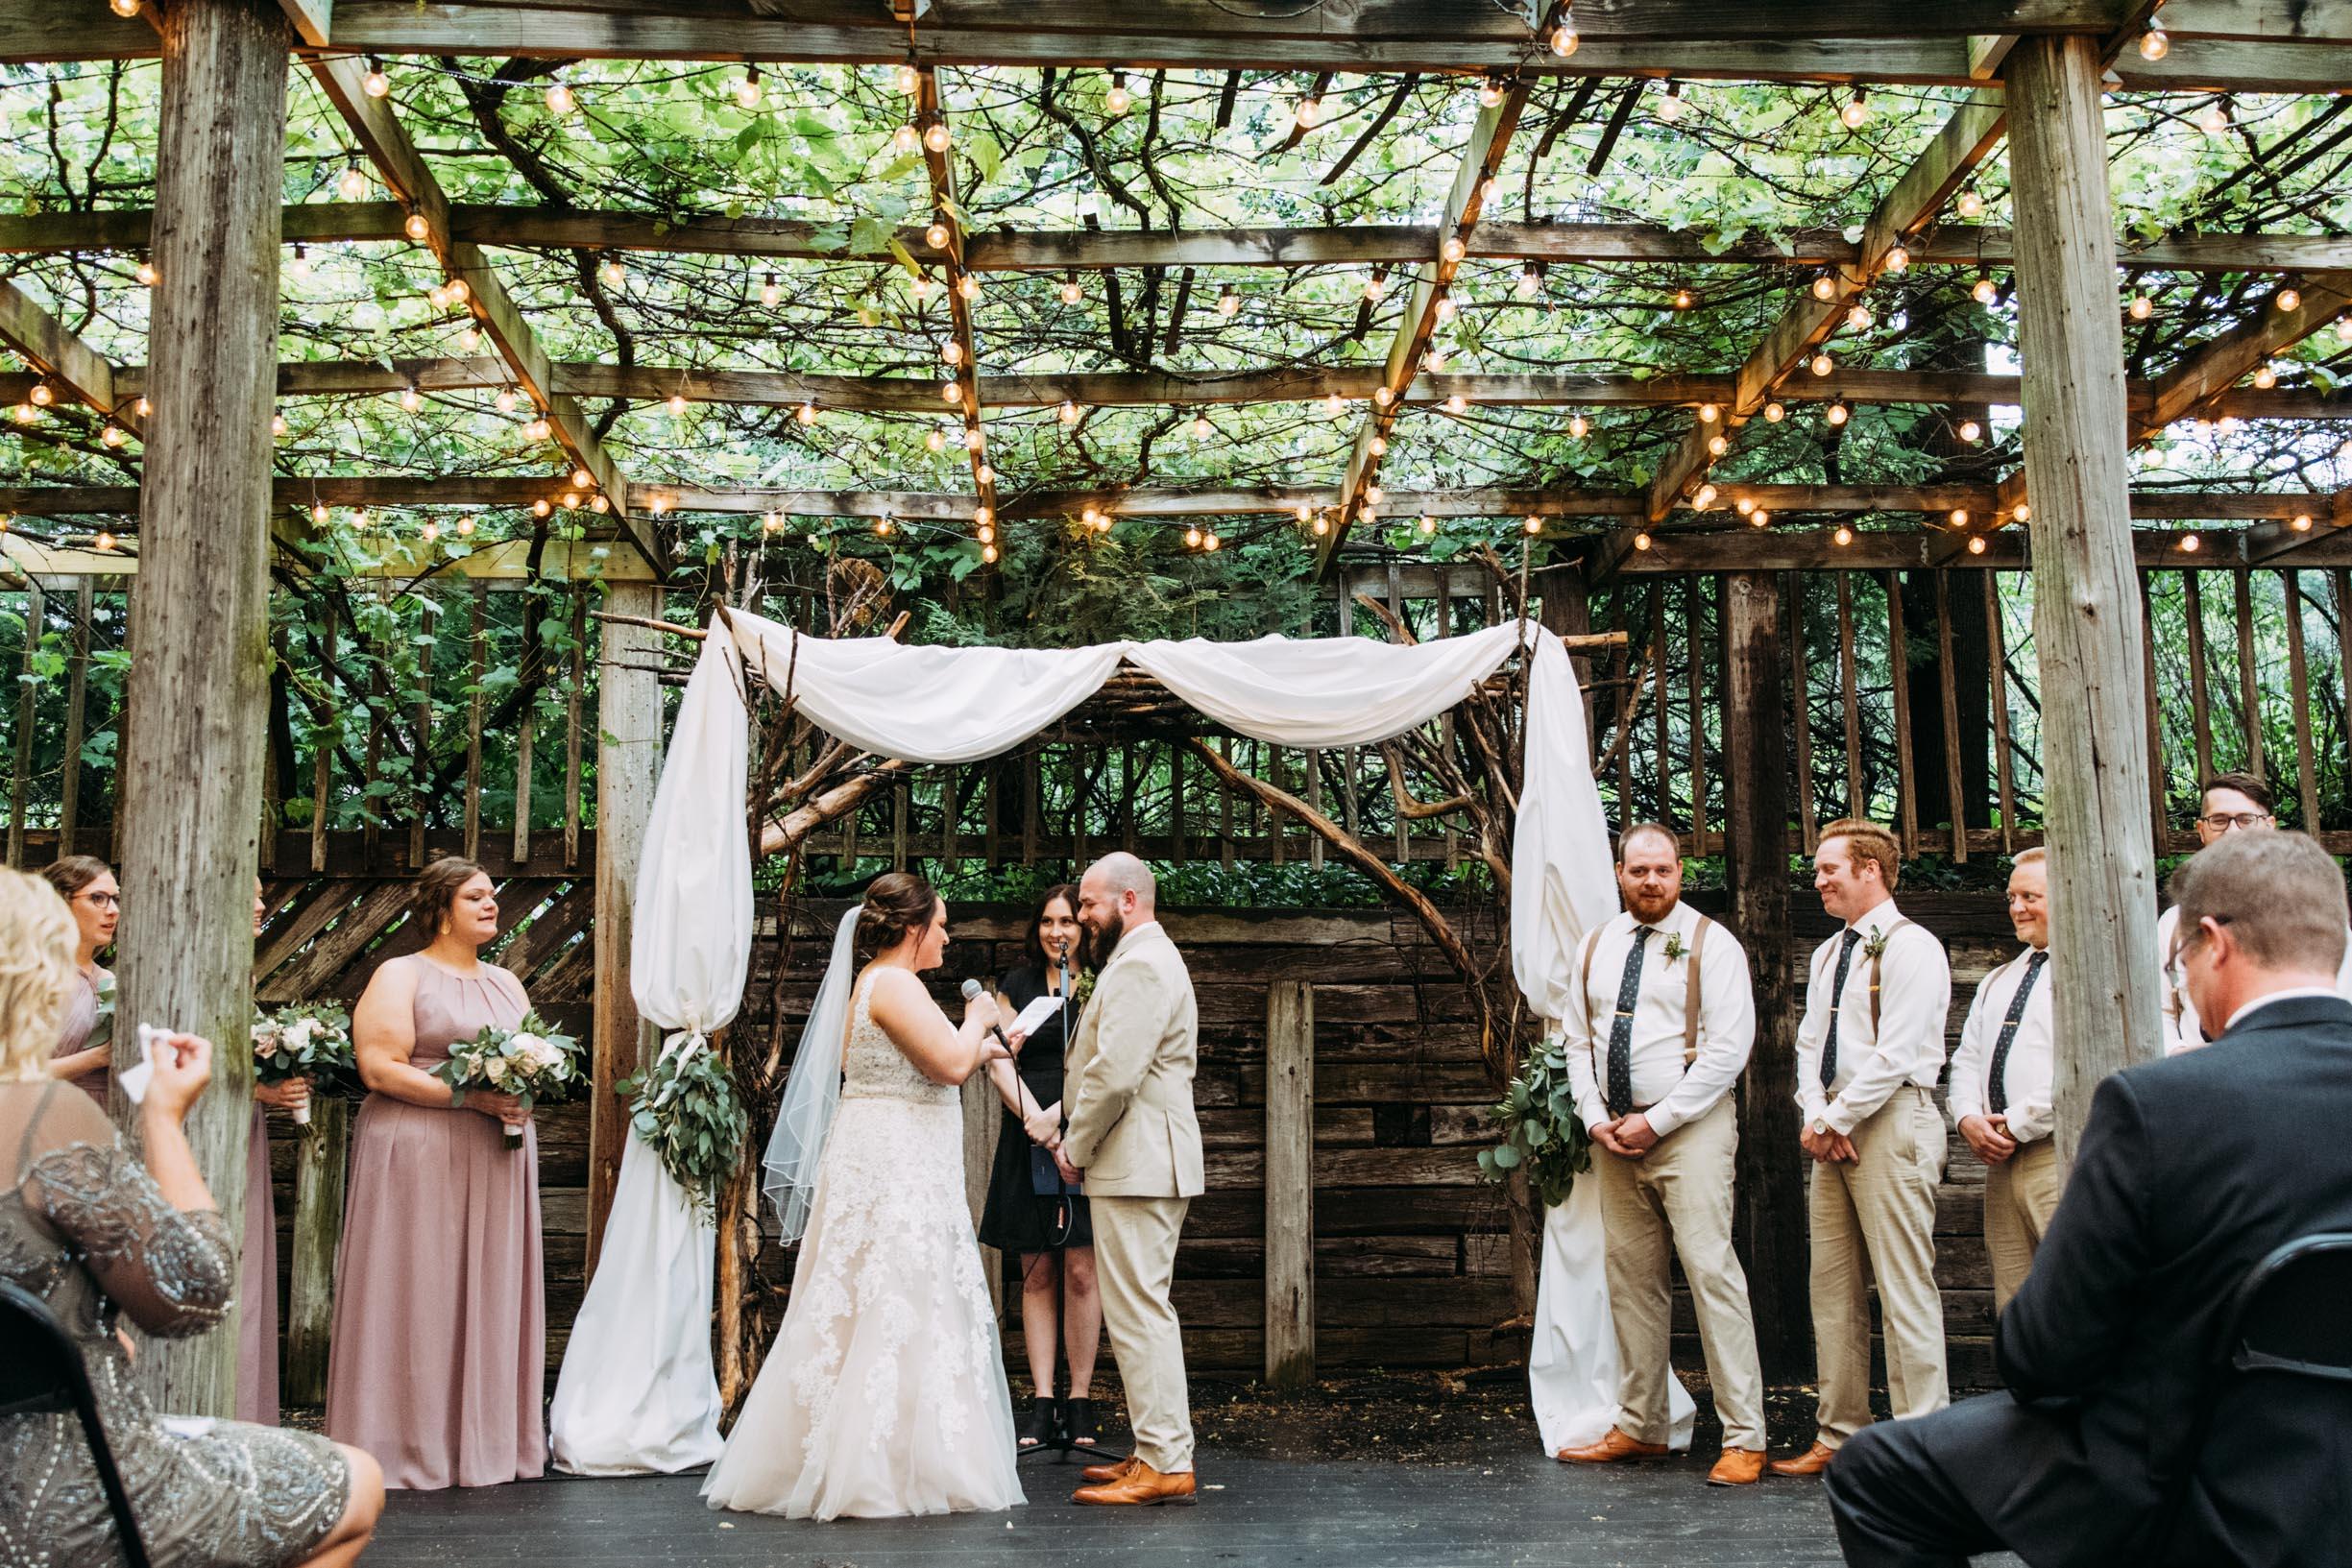 45-Jess_Jeremy_Minnesota_Wedding_Ceremony.jpg